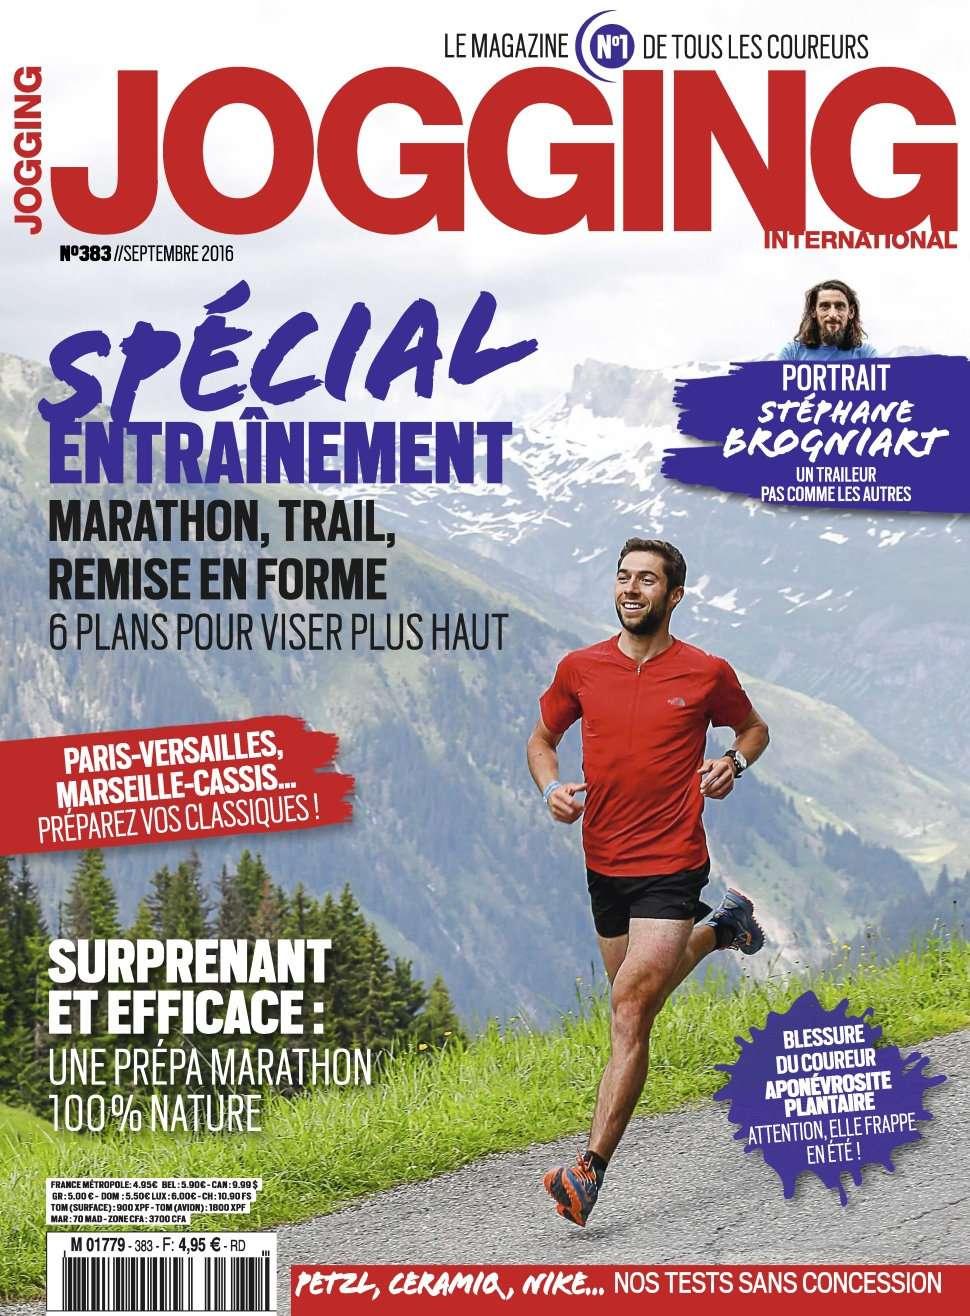 Jogging International 383 - Septembre 2016